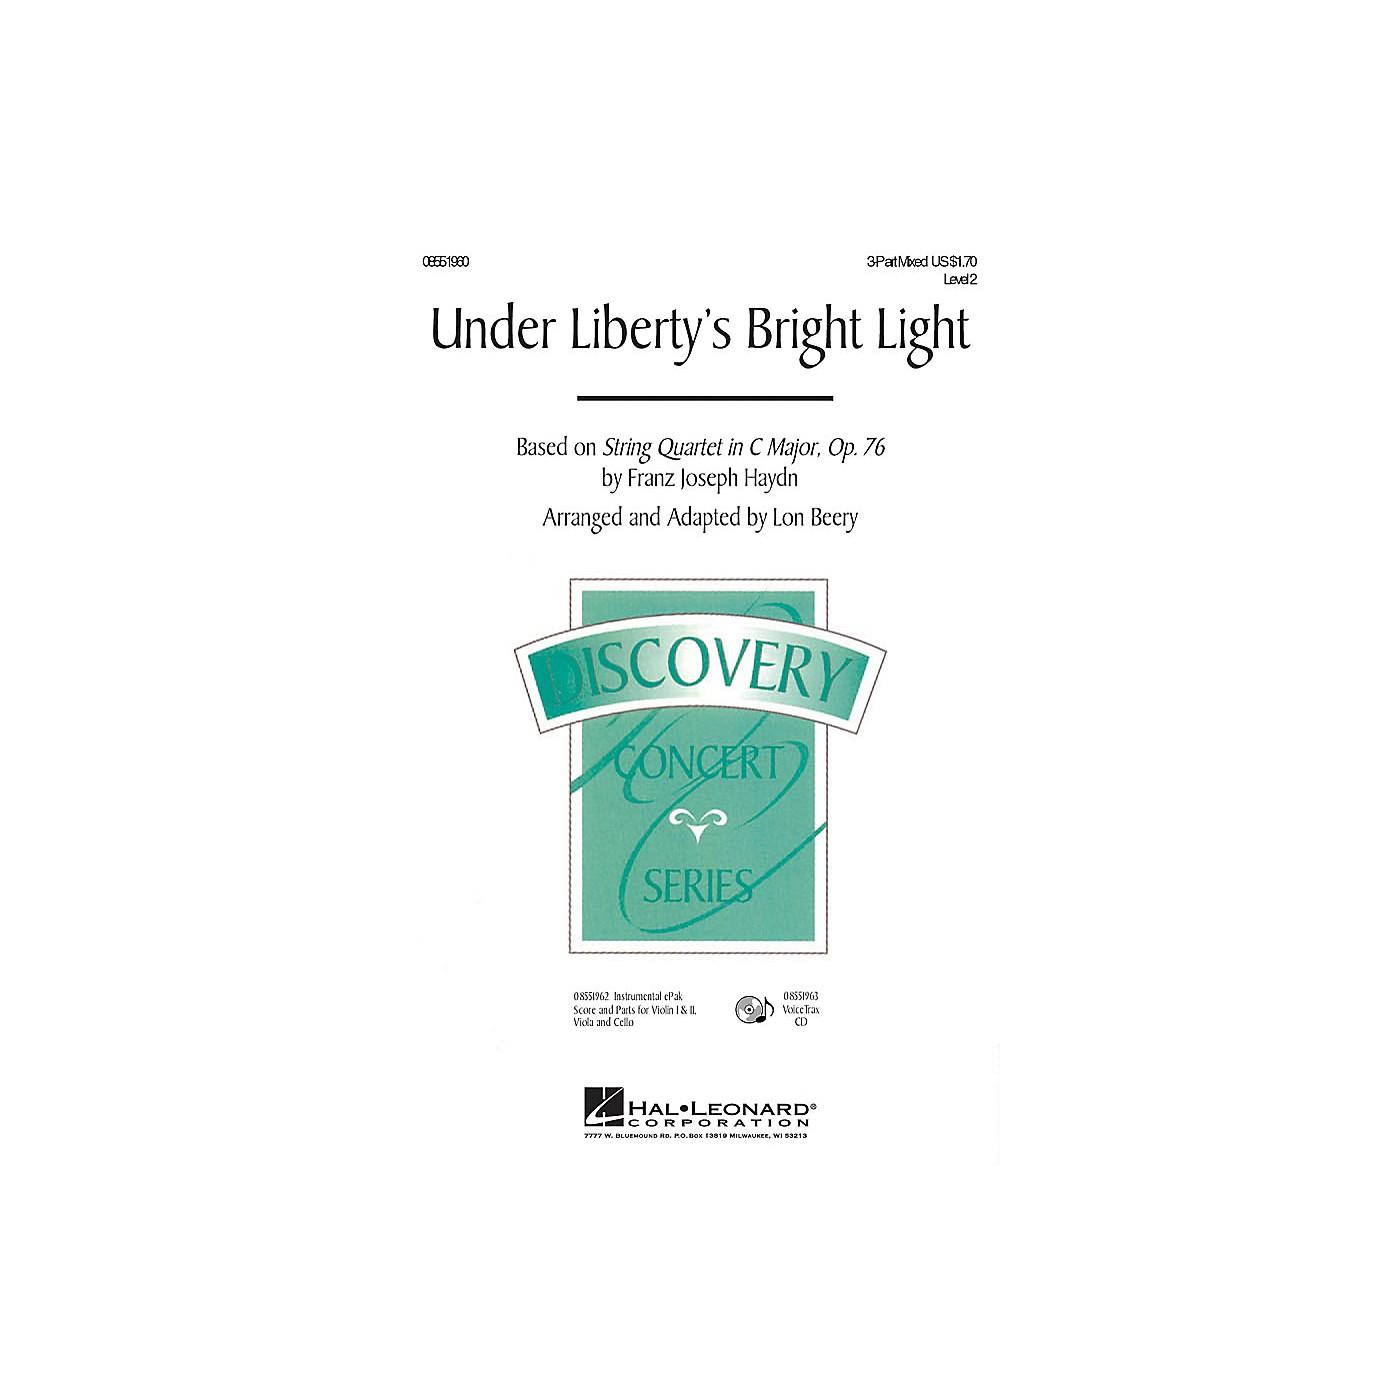 Hal Leonard Under Liberty's Bright Light IPAKS Arranged by Lon Beery thumbnail